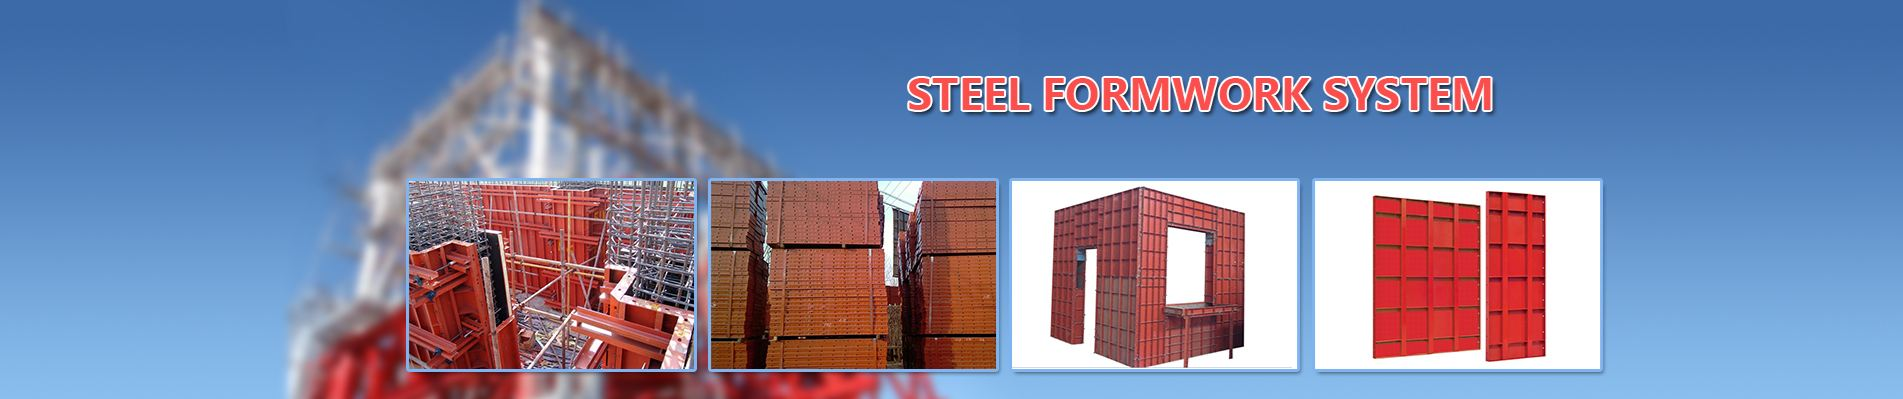 steel-formwork